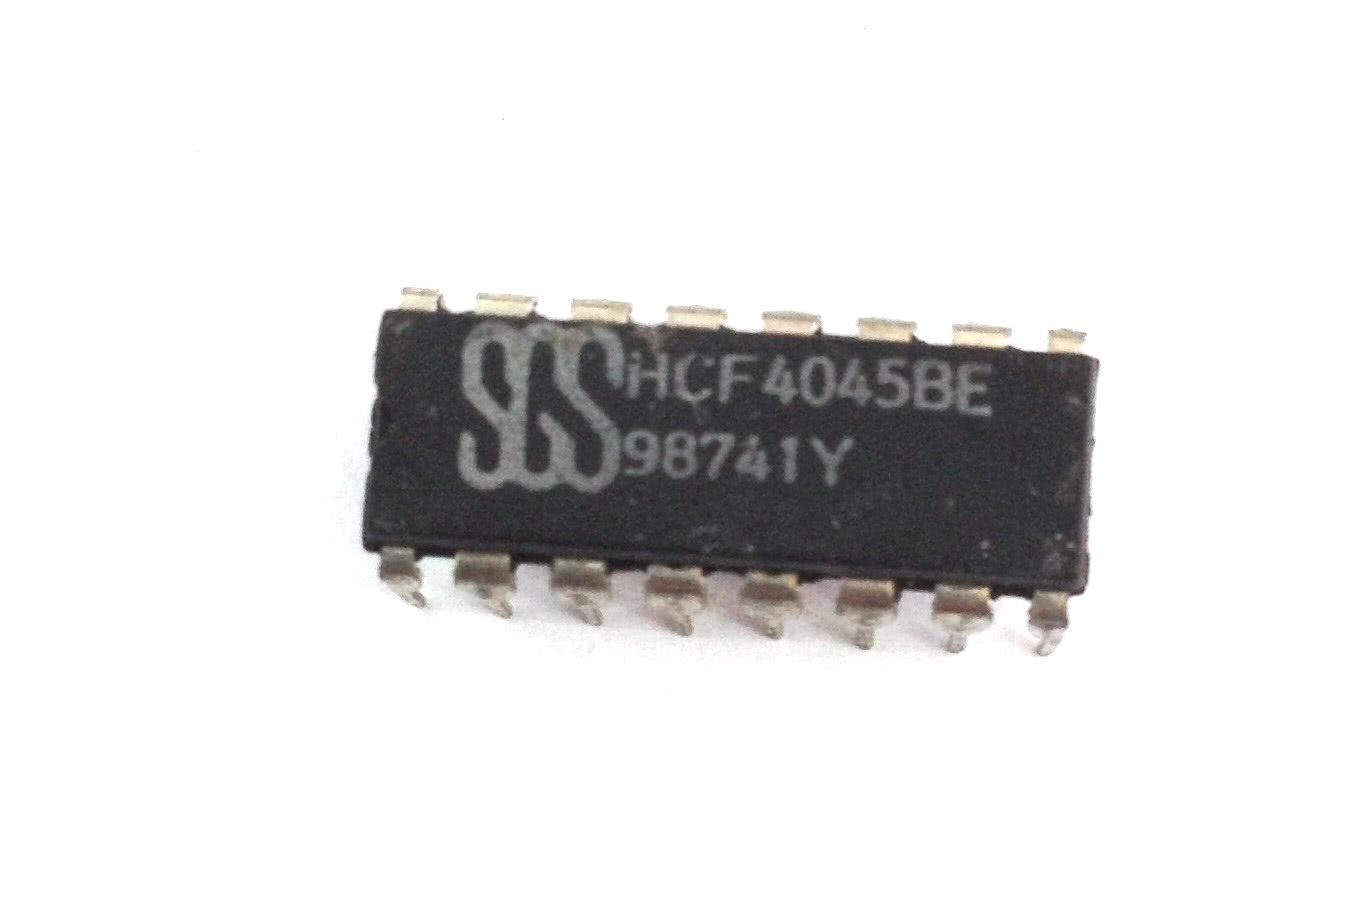 Circuito Integrado CMOS 4045 Contador 21 Estagios  CMOS   6